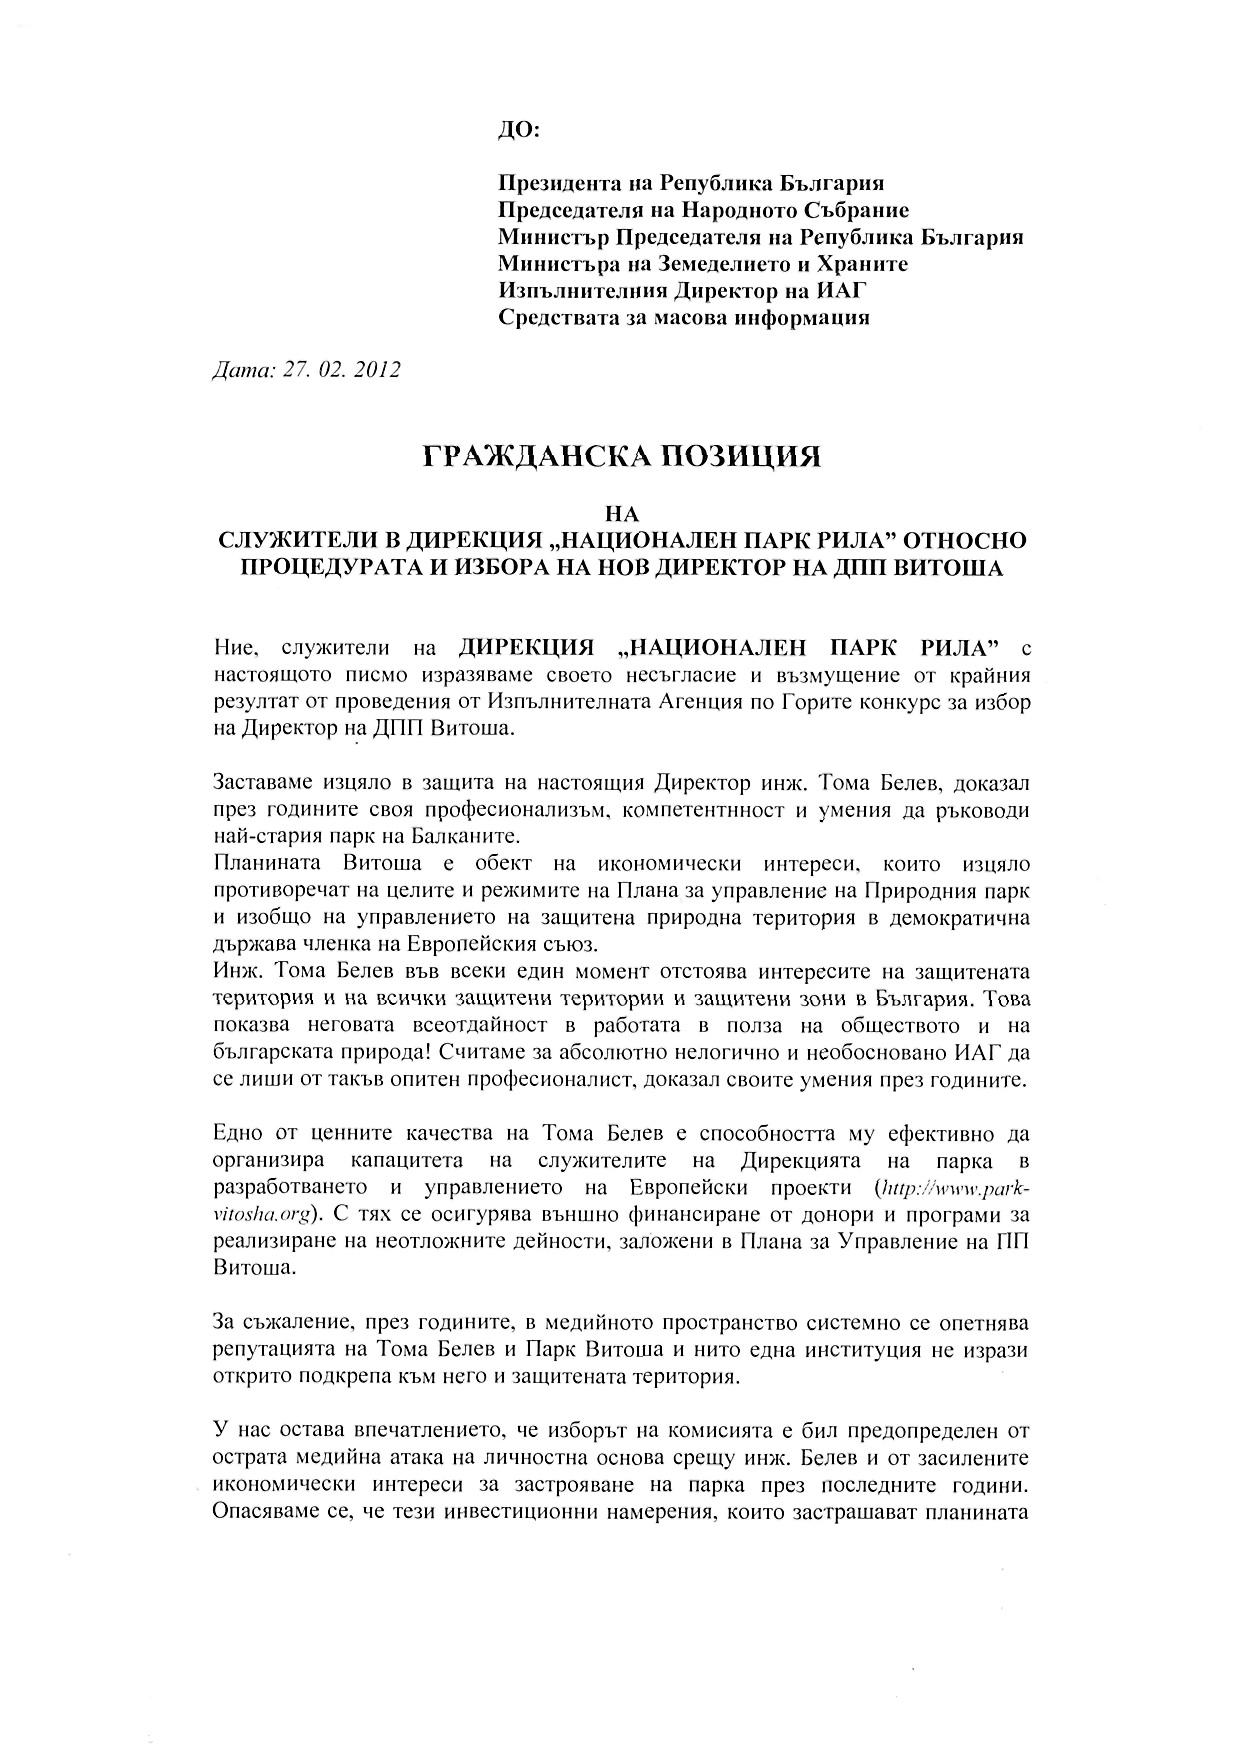 Pismo-Director-PP-Vitosha_DNP_Rila-1